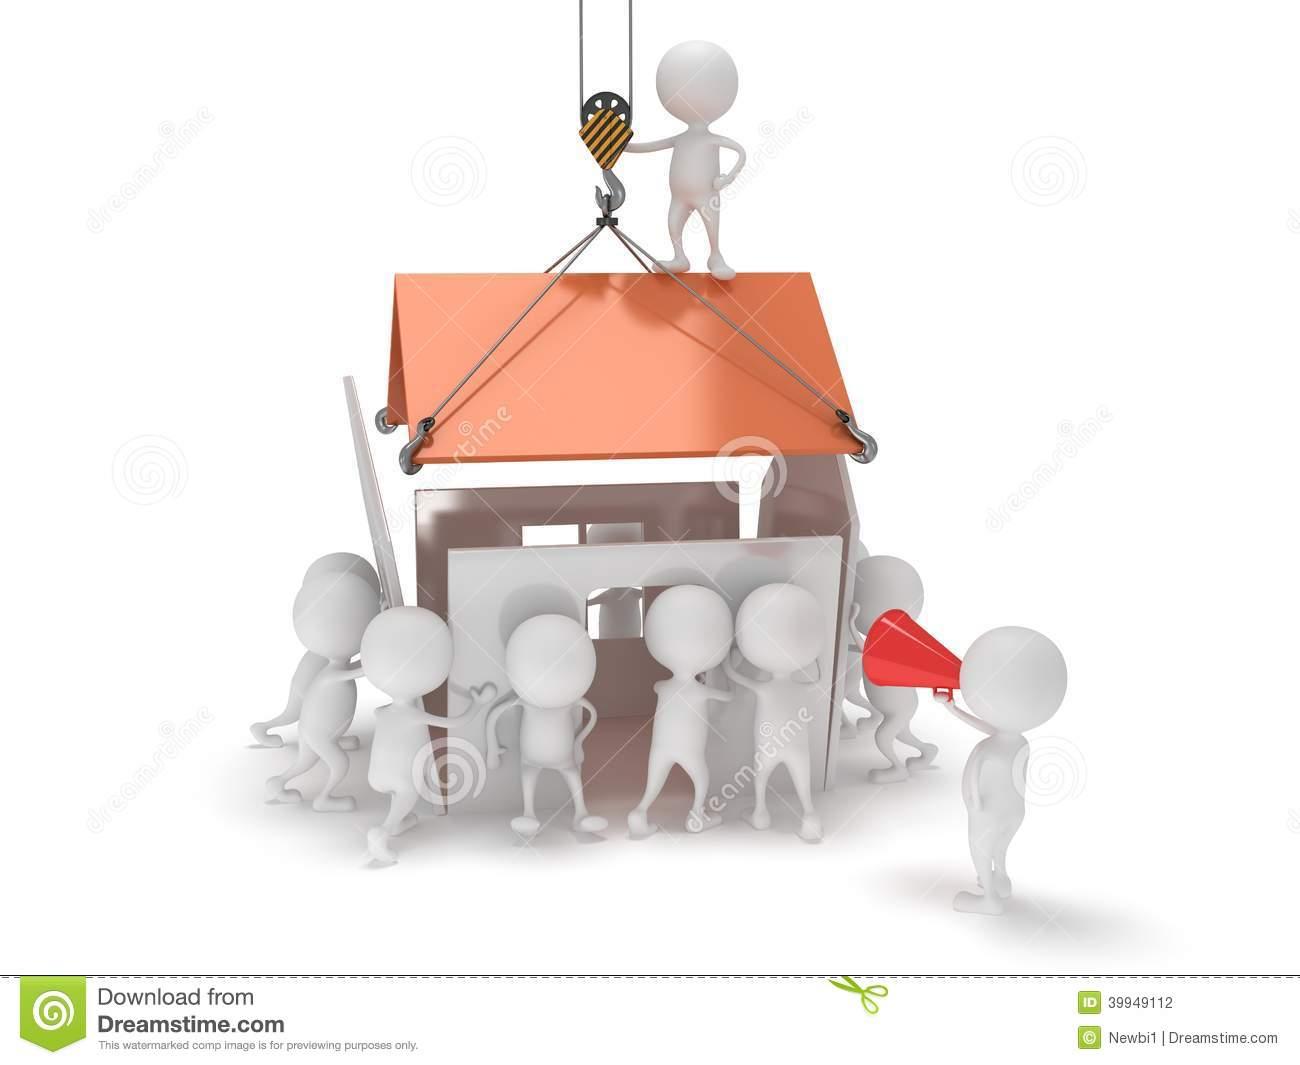 Haus bauen clipart.